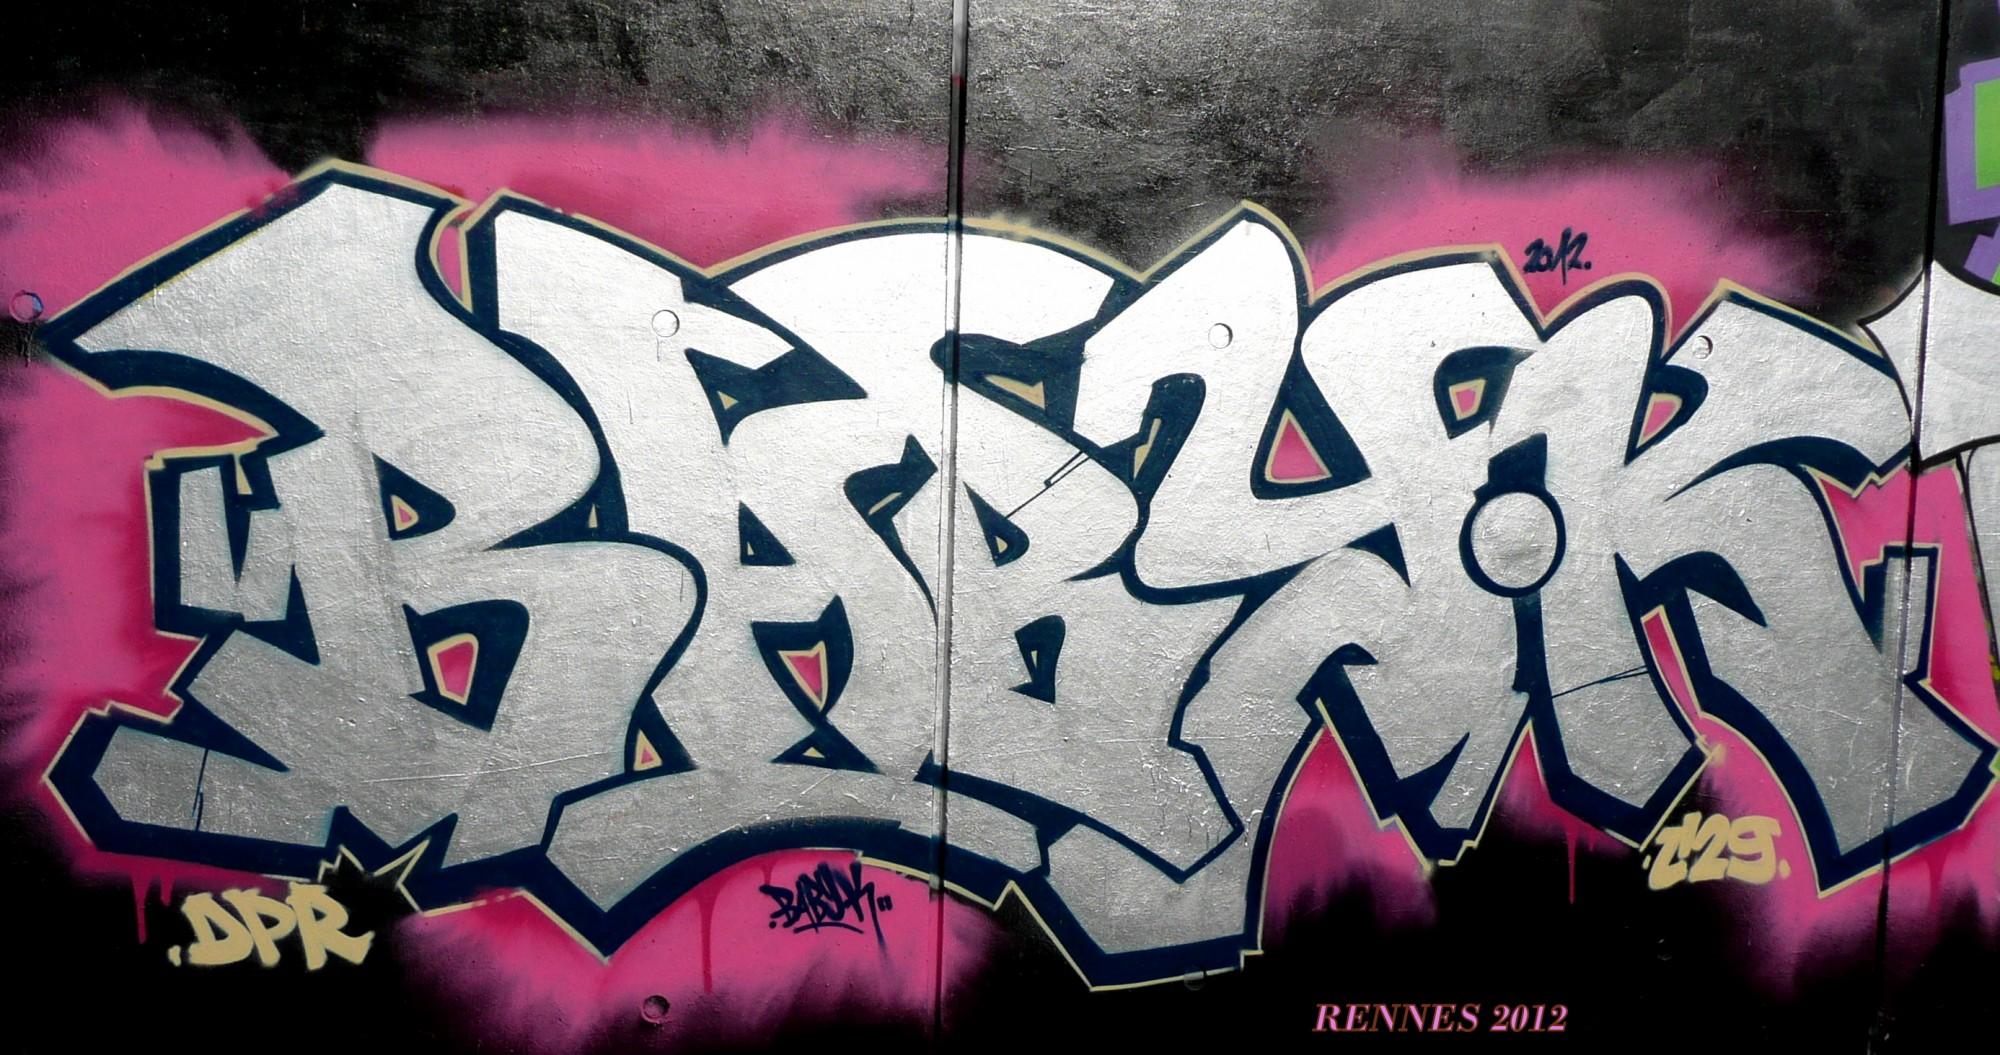 rennes2012